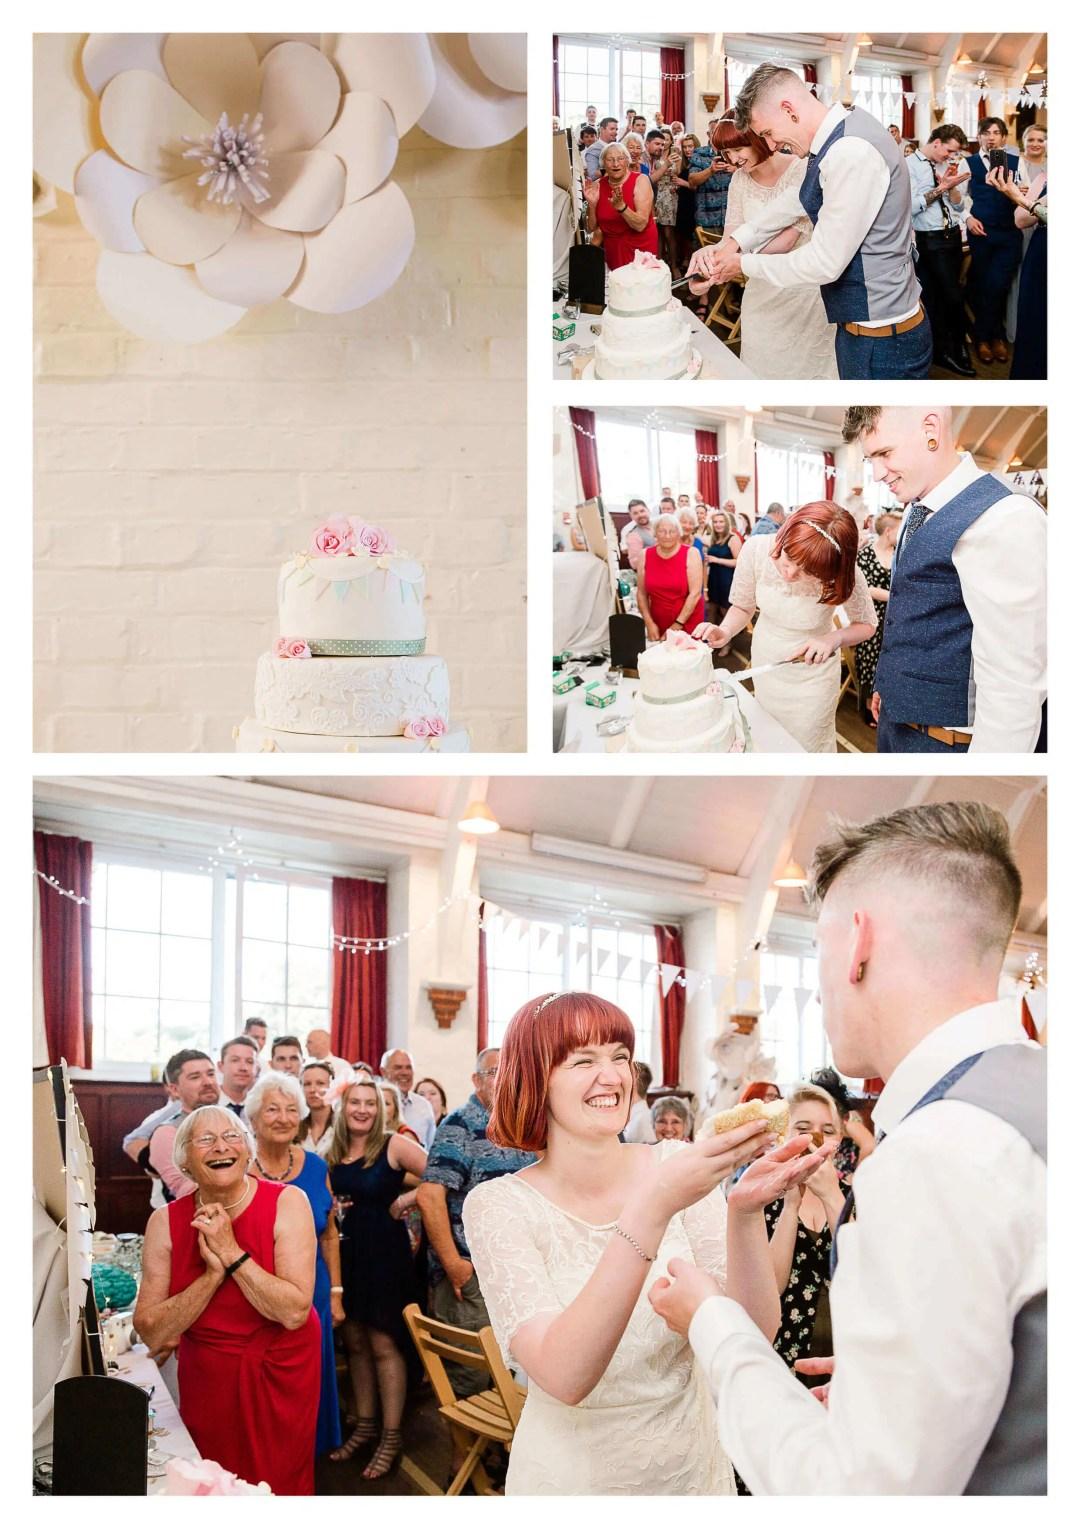 Worplesdon Memorial Hall wedding cake cutting photography | Guildford Photographer